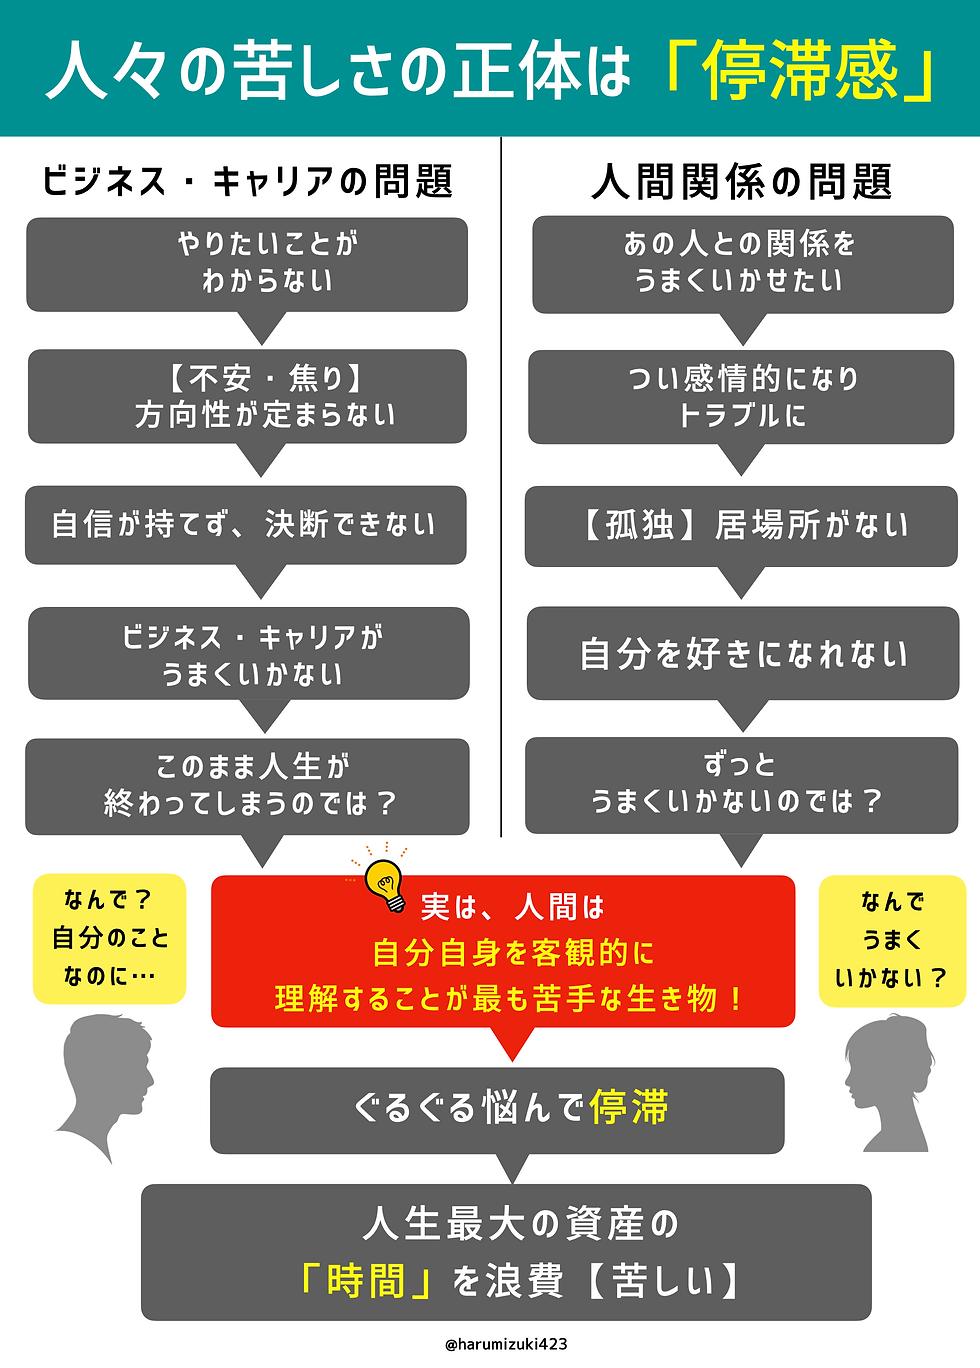 01 Twitter固定ツイート.002.png